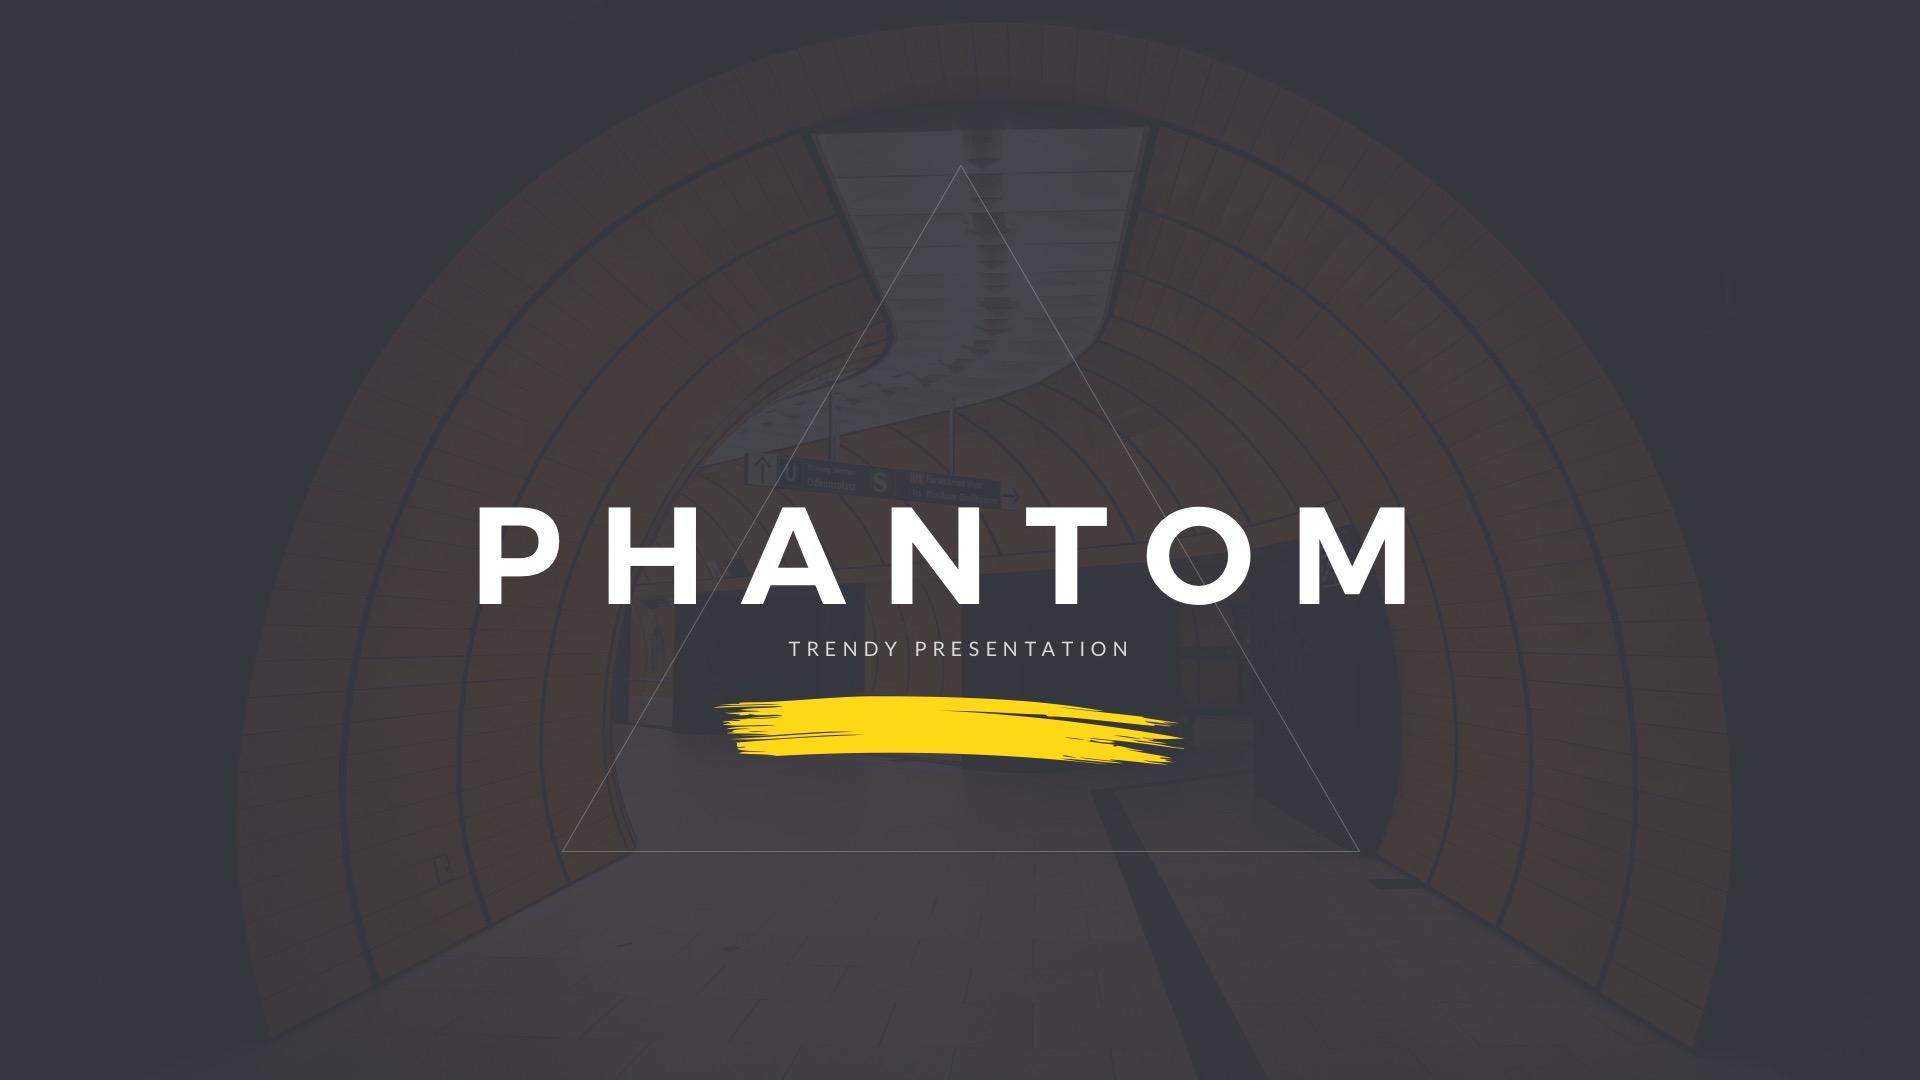 Phantom Modern Google Slides Template by slidefusion   GraphicRiver